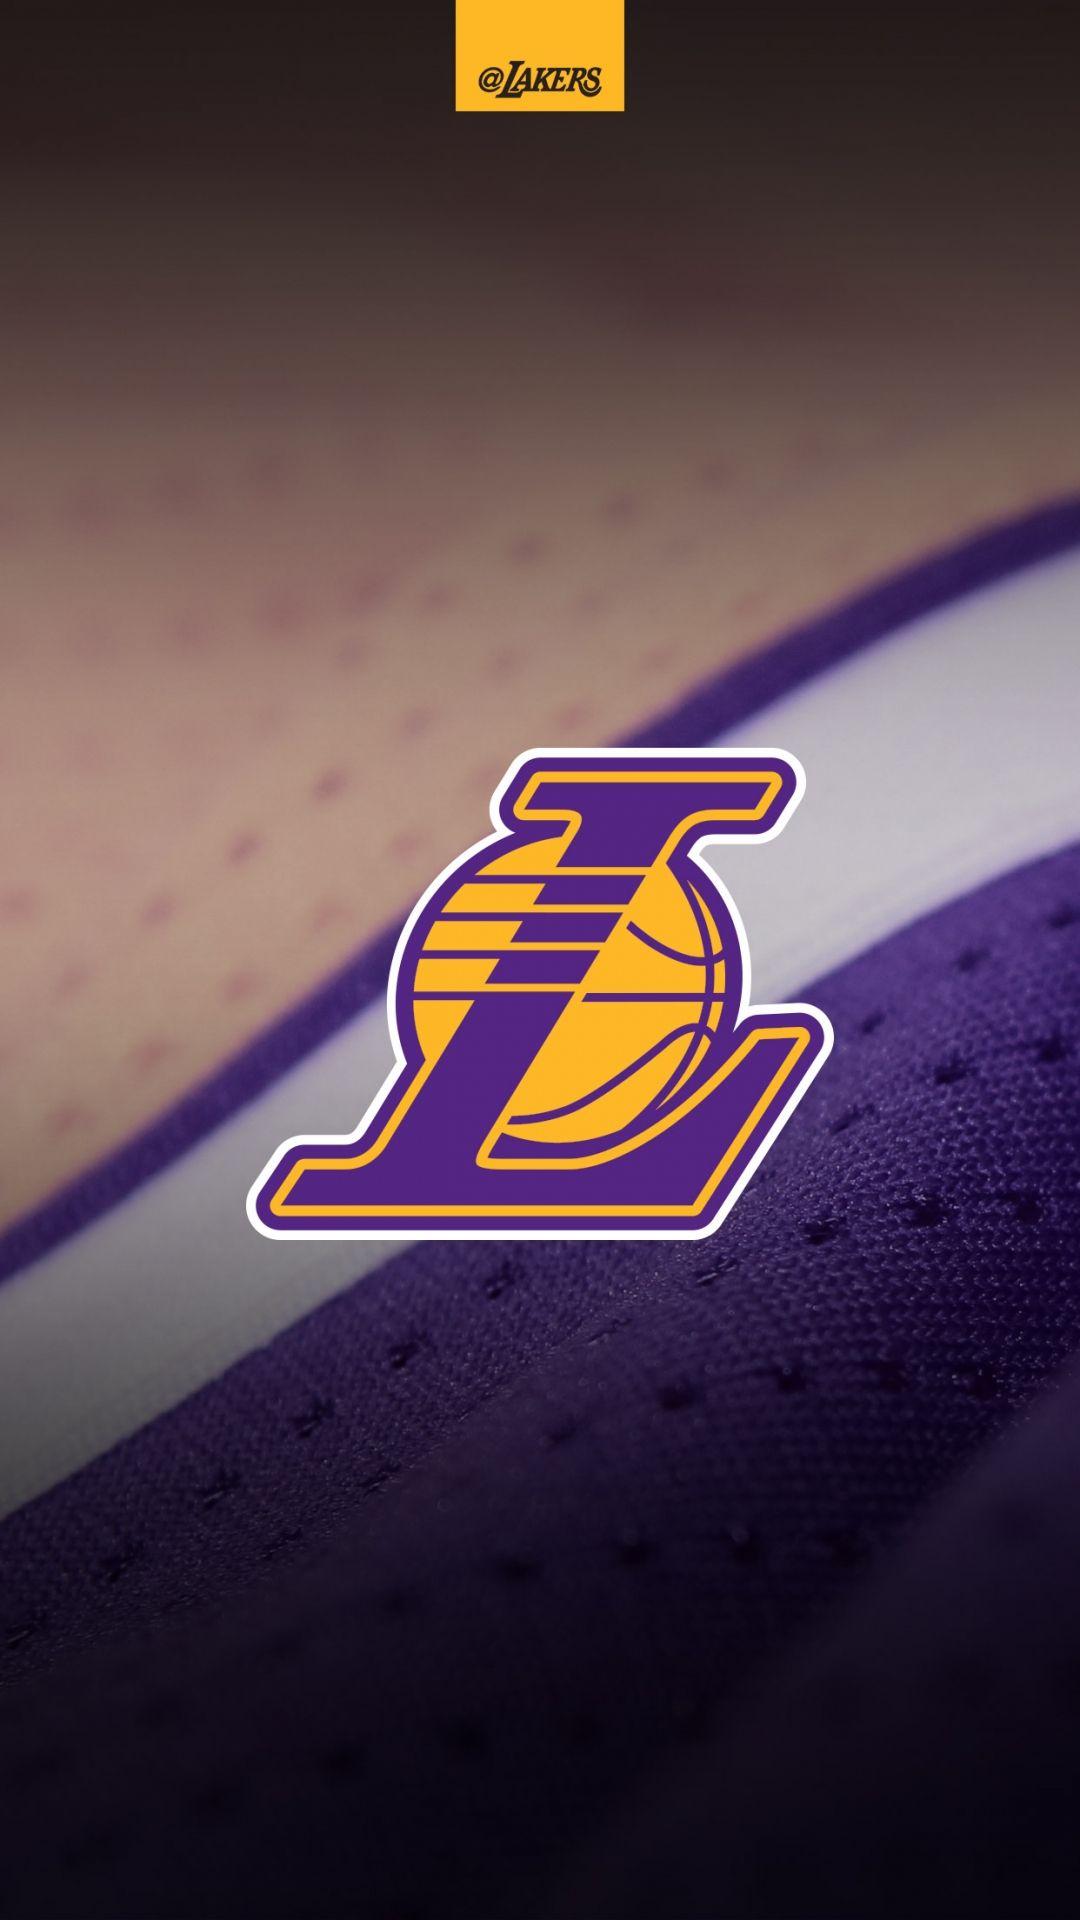 Black Mamba Kobe Bryant Photo Lakers Wallpaper Basketball Iphone Wallpaper Lakers Logo